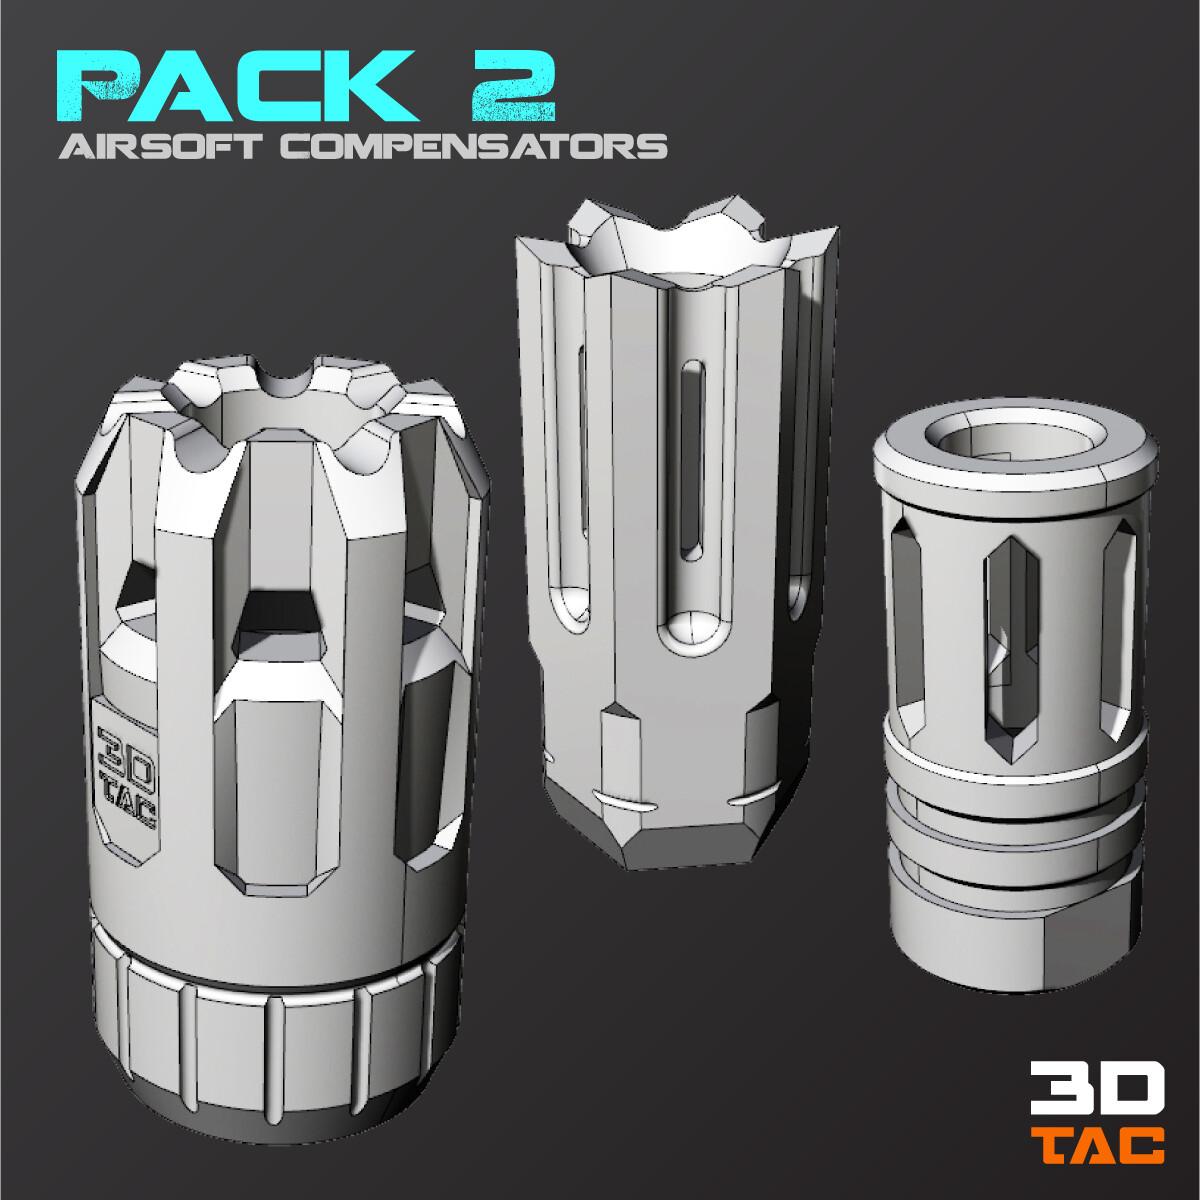 Paquete Compensadores 2 / Archivos 3D Files